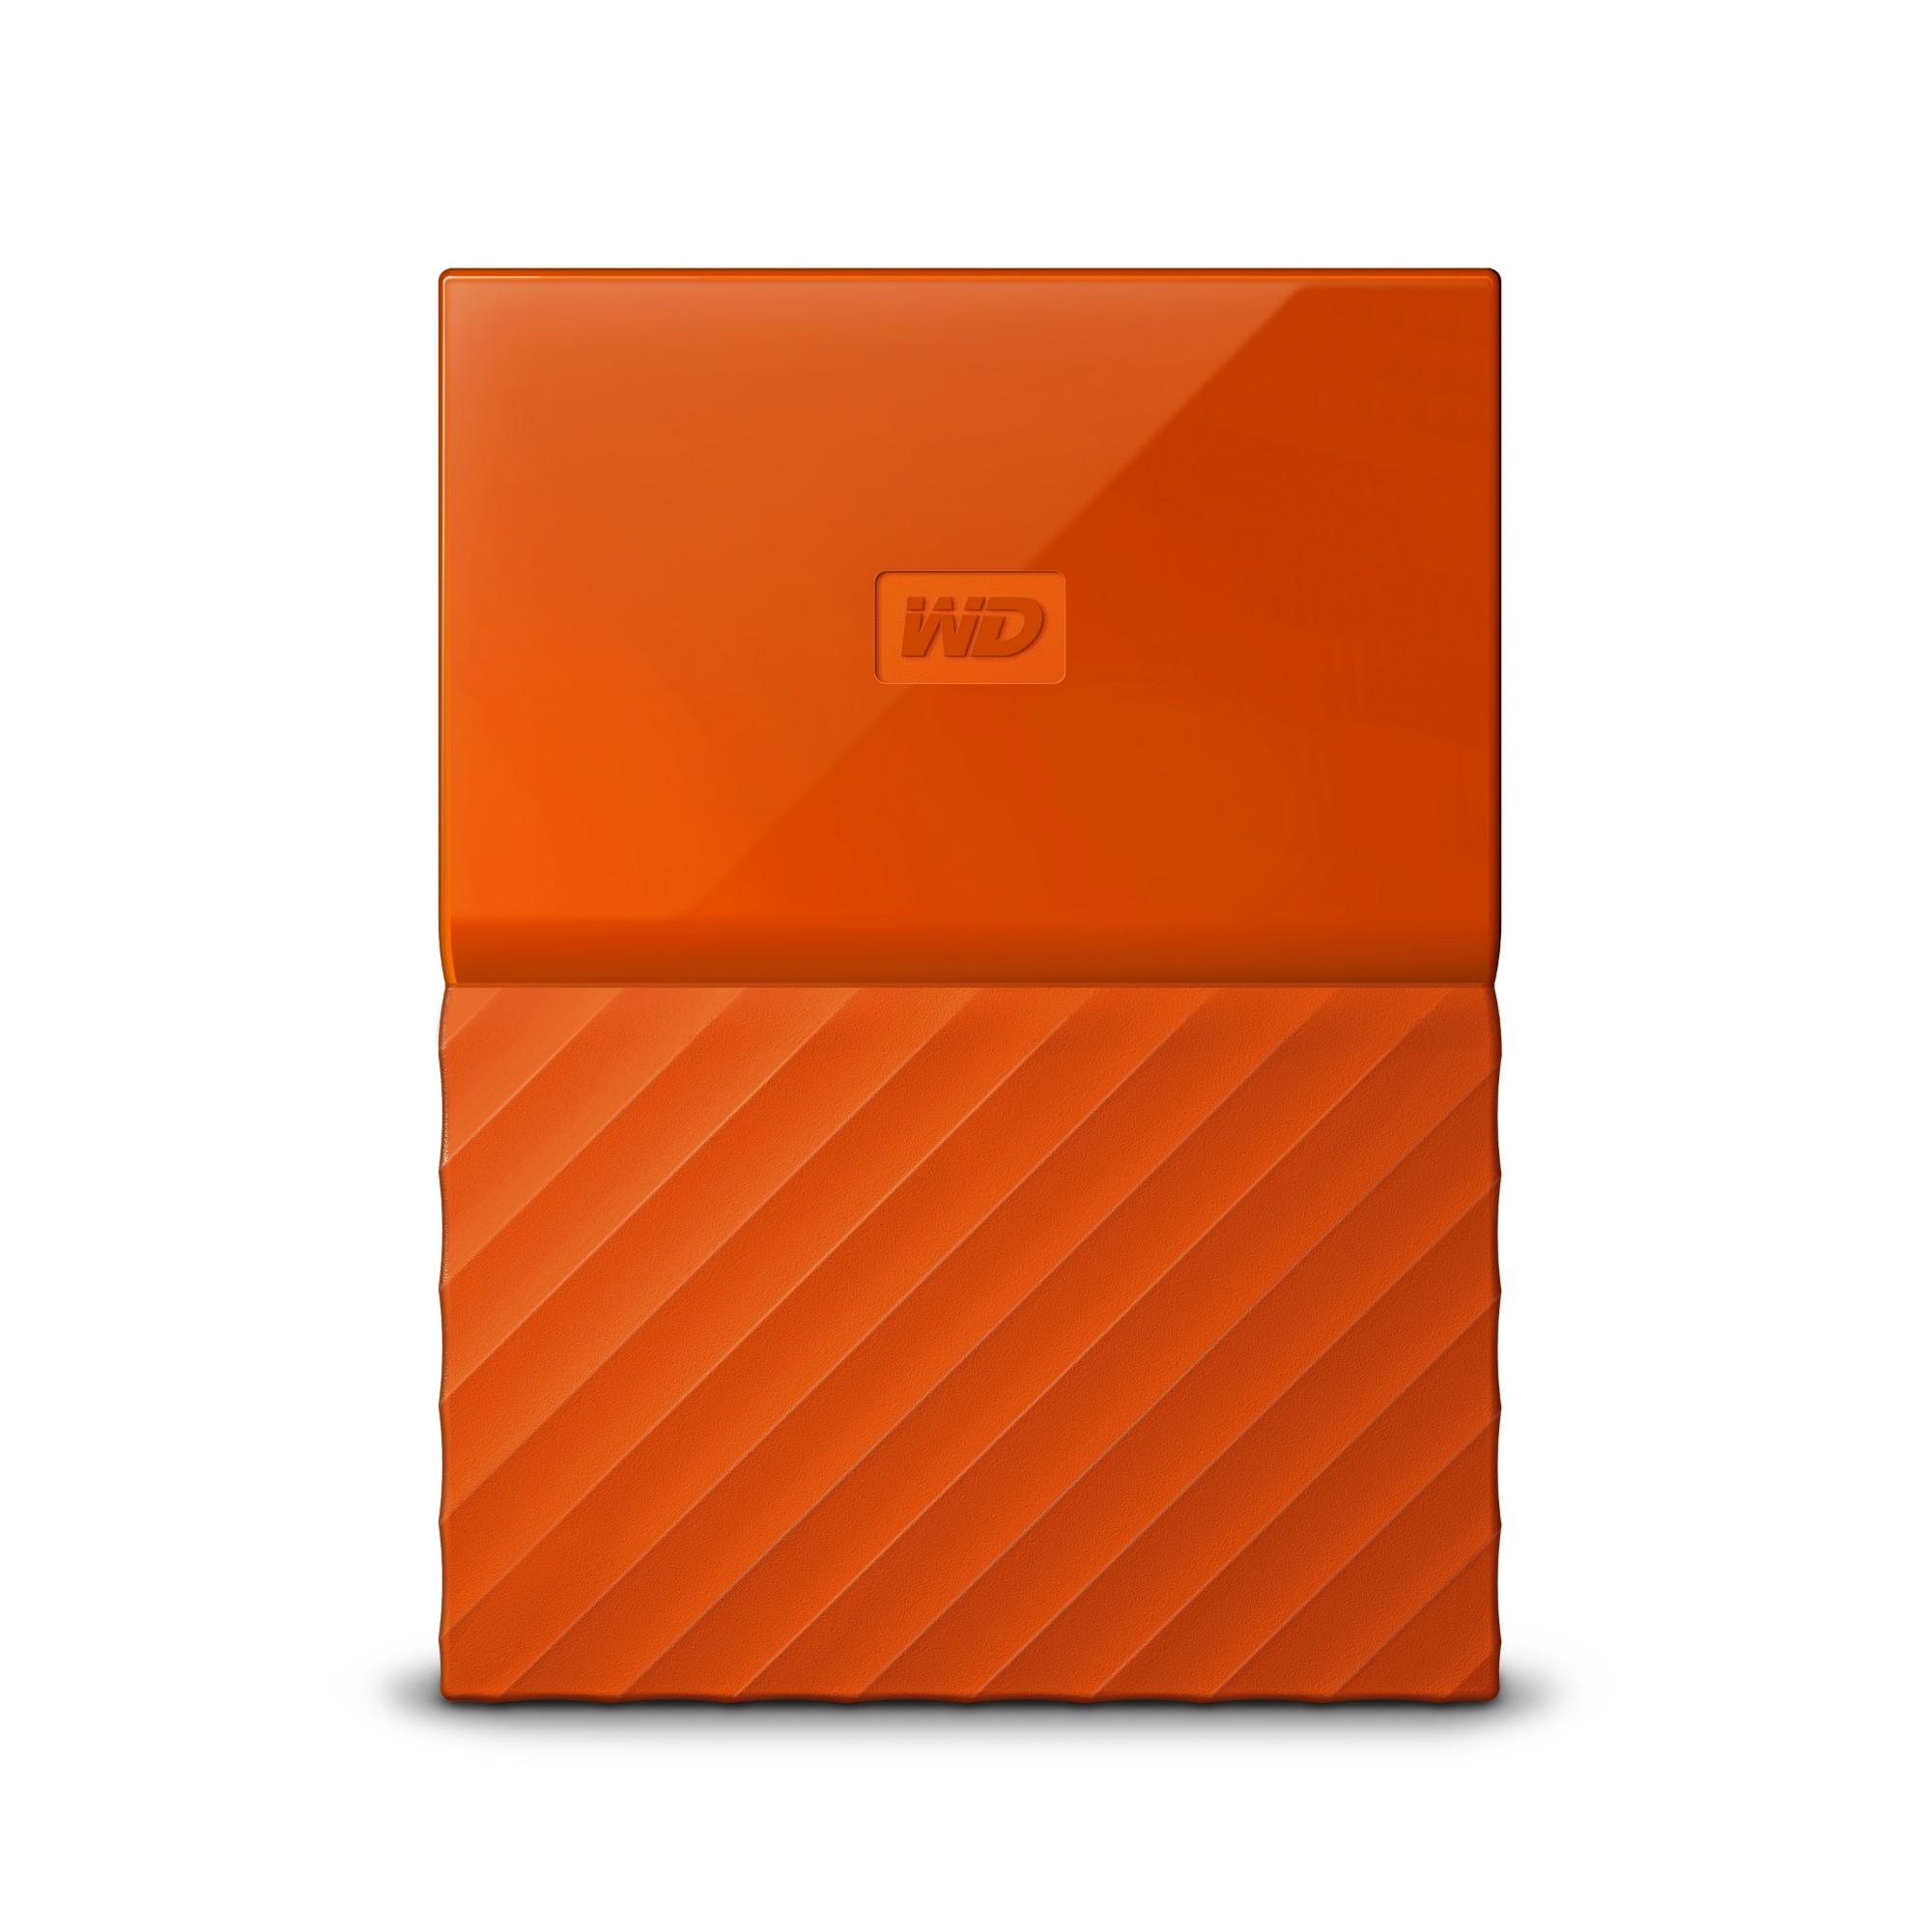 Western Digital My Passport 1000GB Orange external hard drive